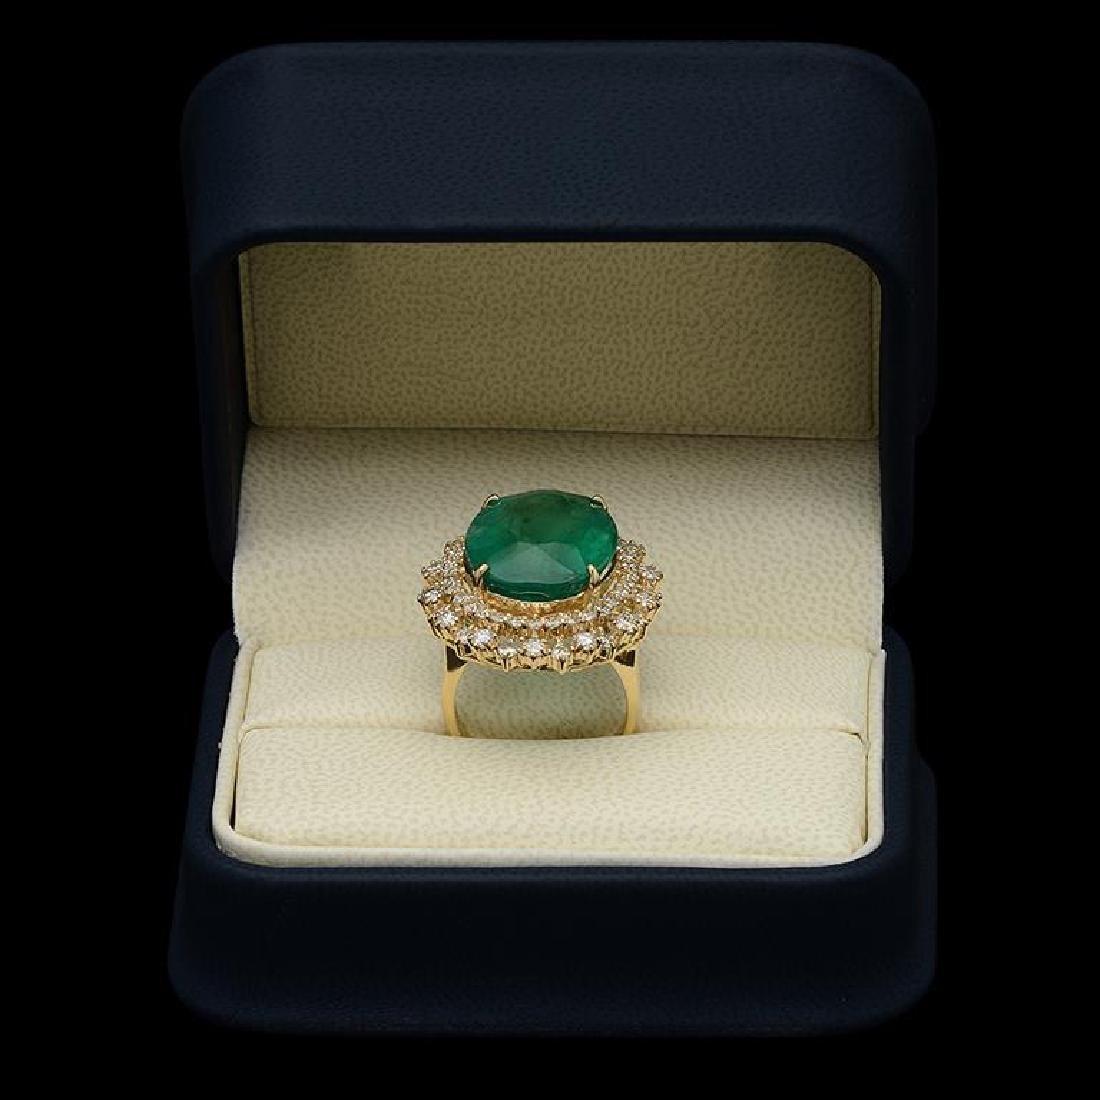 14K Gold 17.93ct Emerald 2.10ct Diamond Ring - 3